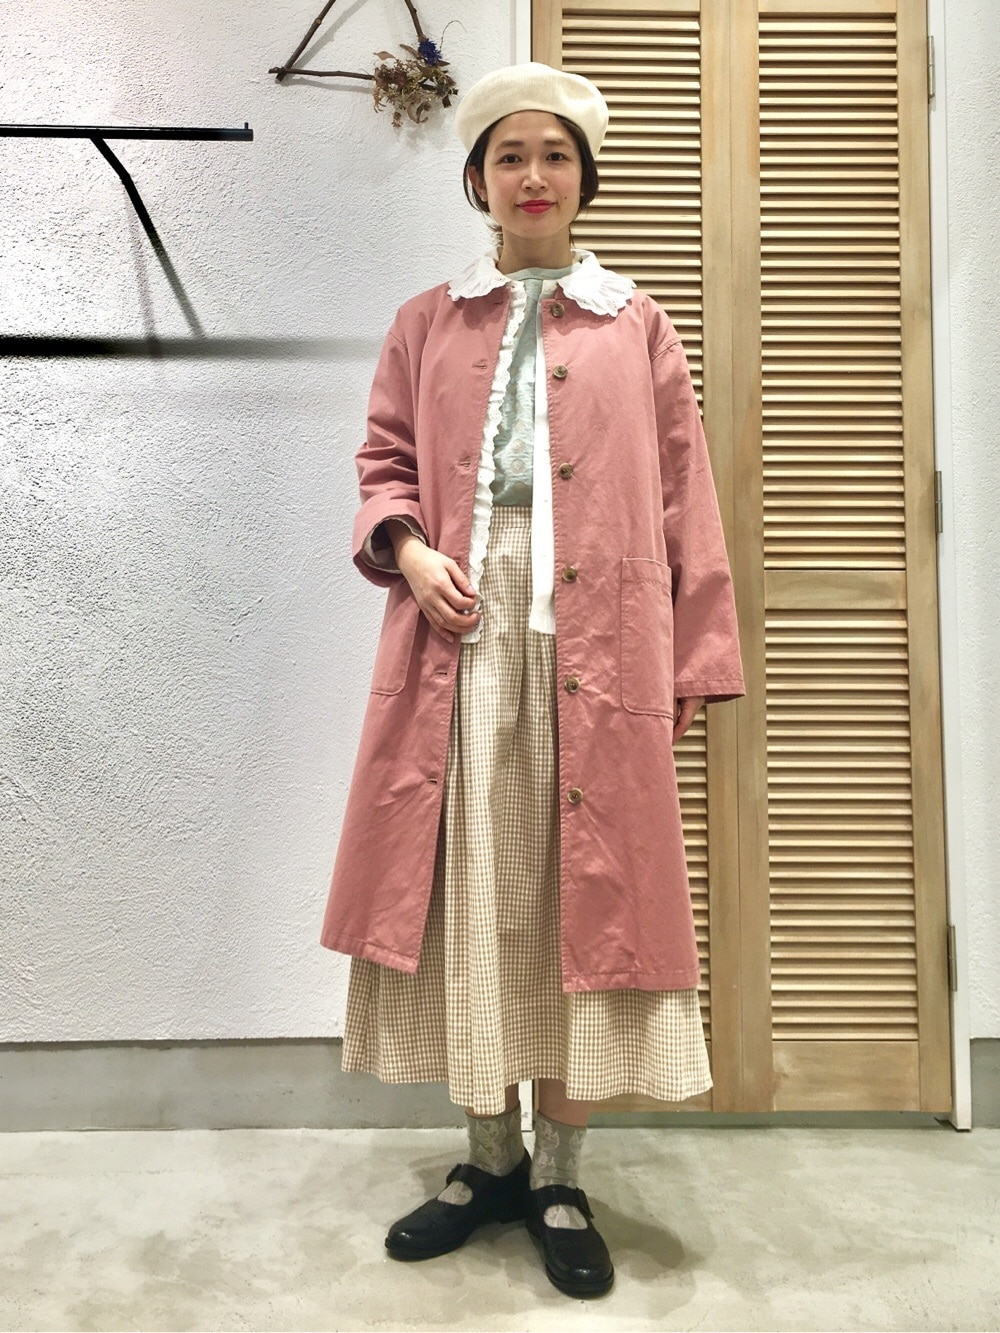 chambre de charme 横浜ジョイナス 身長:160cm 2021.03.01